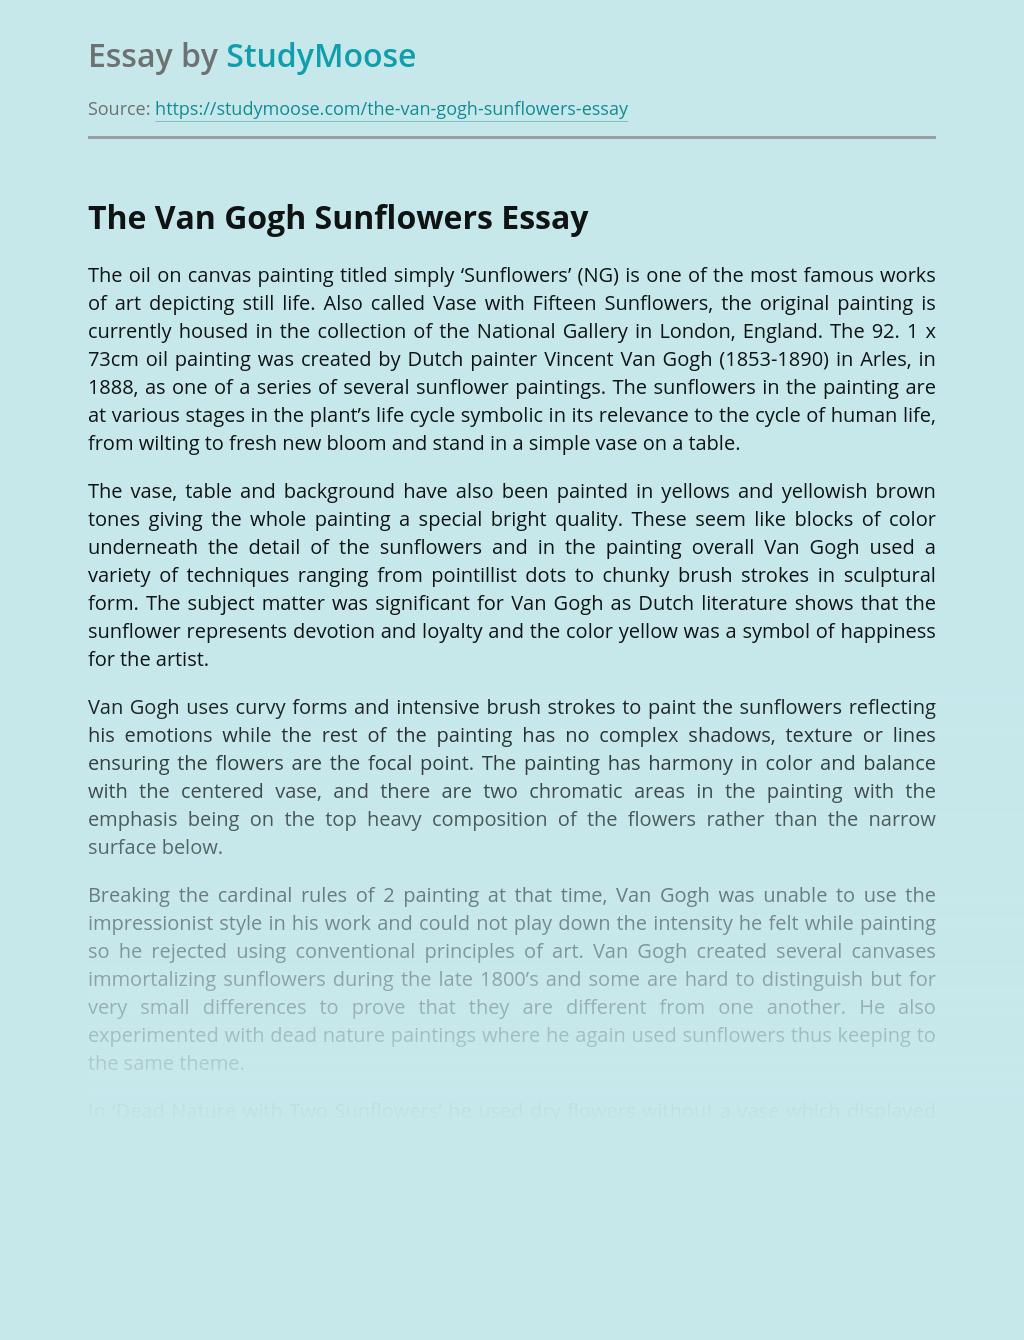 The Van Gogh Sunflowers